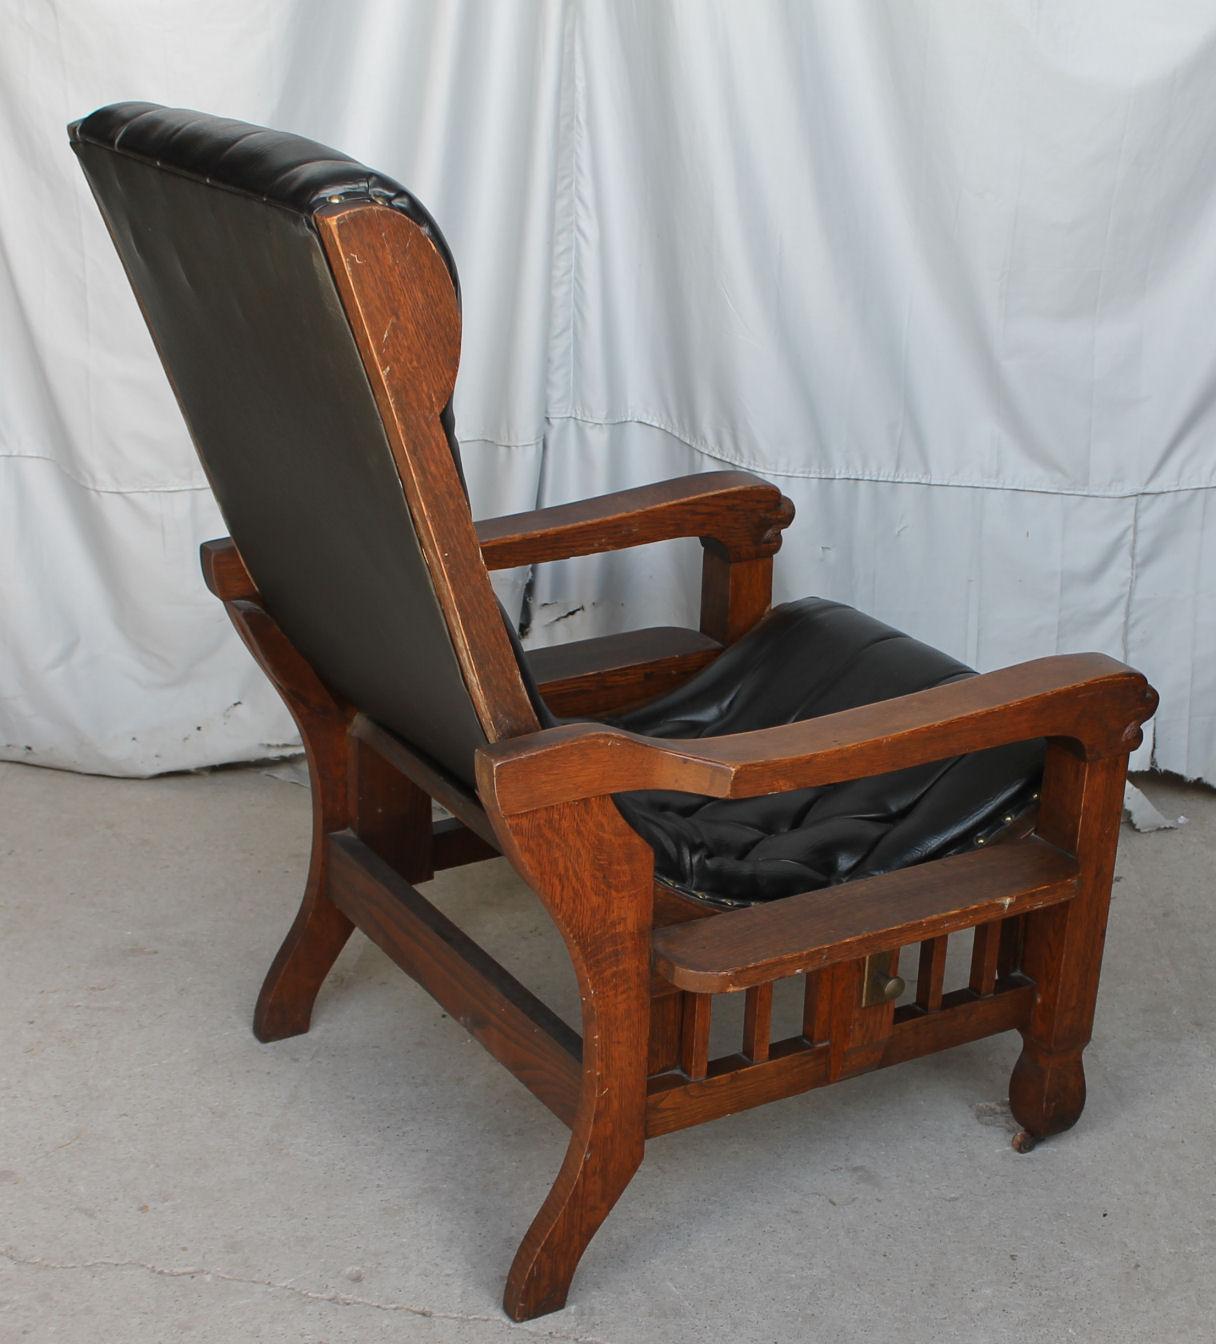 iron rocking chair pier 1 hanging bargain john's antiques | rare oak morris - unusual recliner